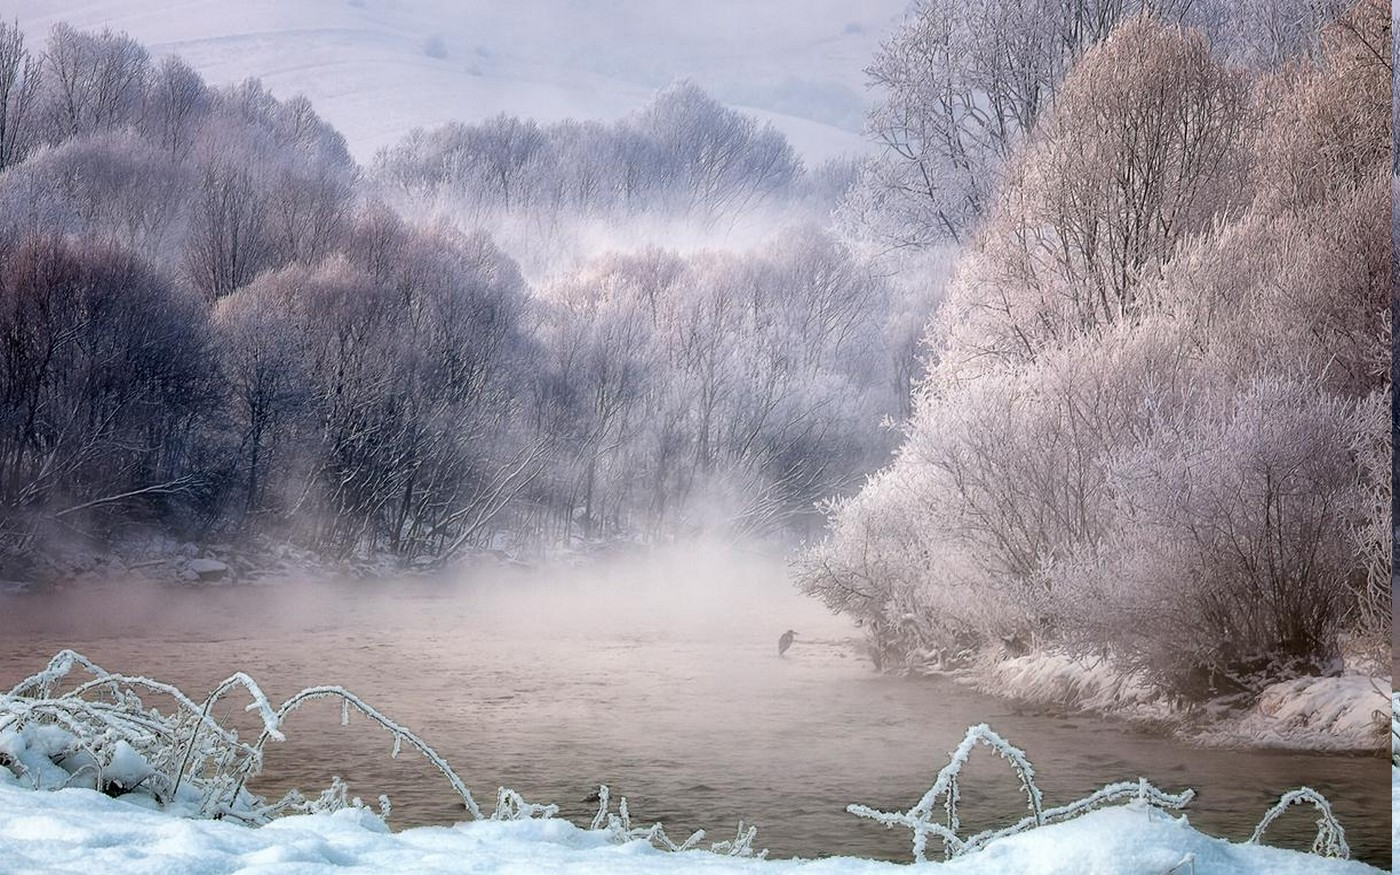 3d Animated Nature Wallpaper For Mobile Nature Landscape Winter Mist River Trees Birds Snow